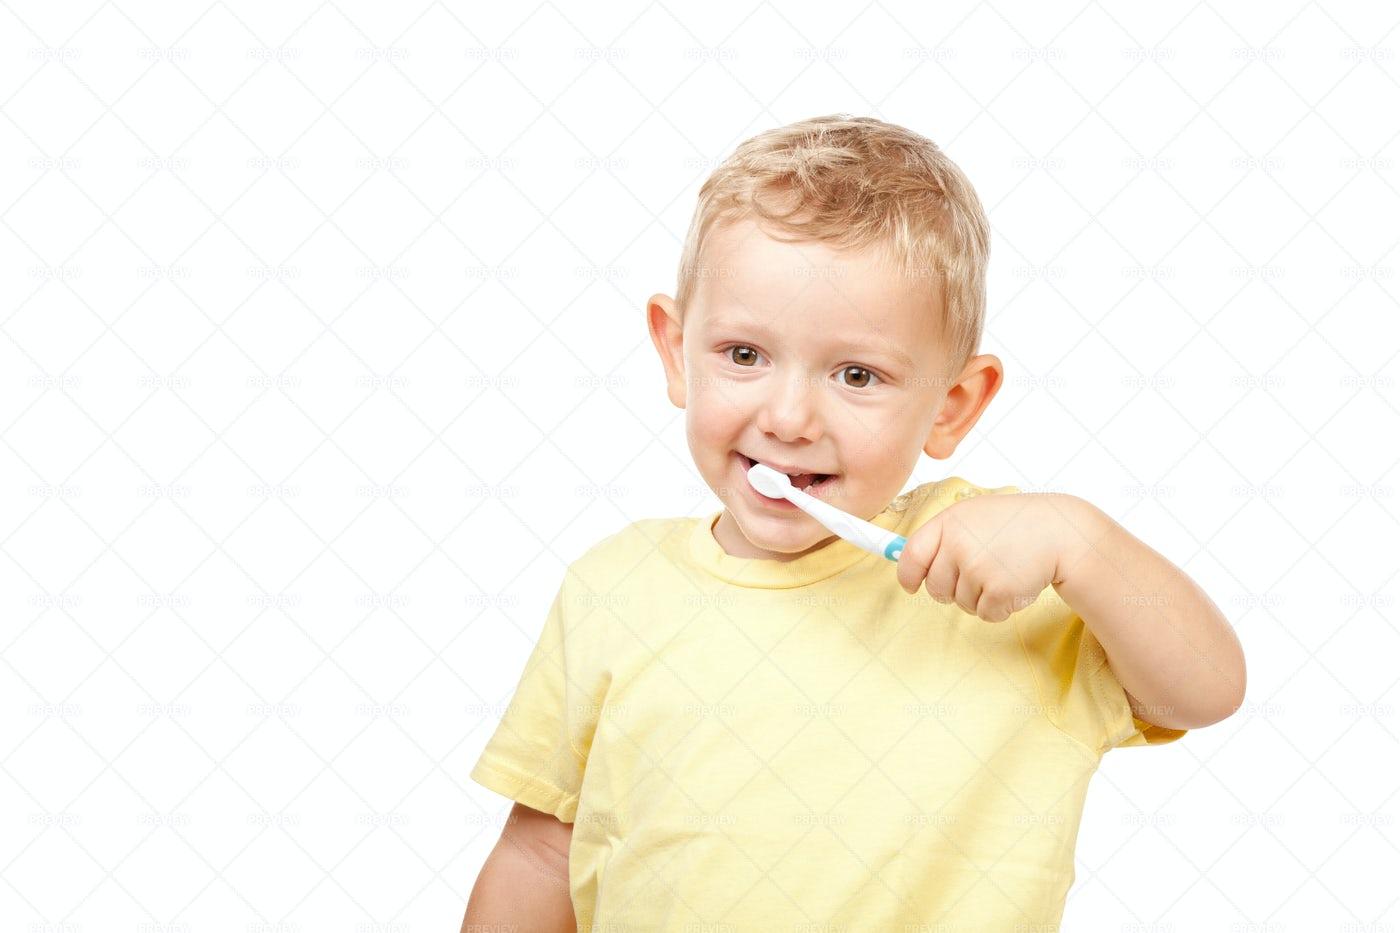 Boy Brushing Teeth: Stock Photos